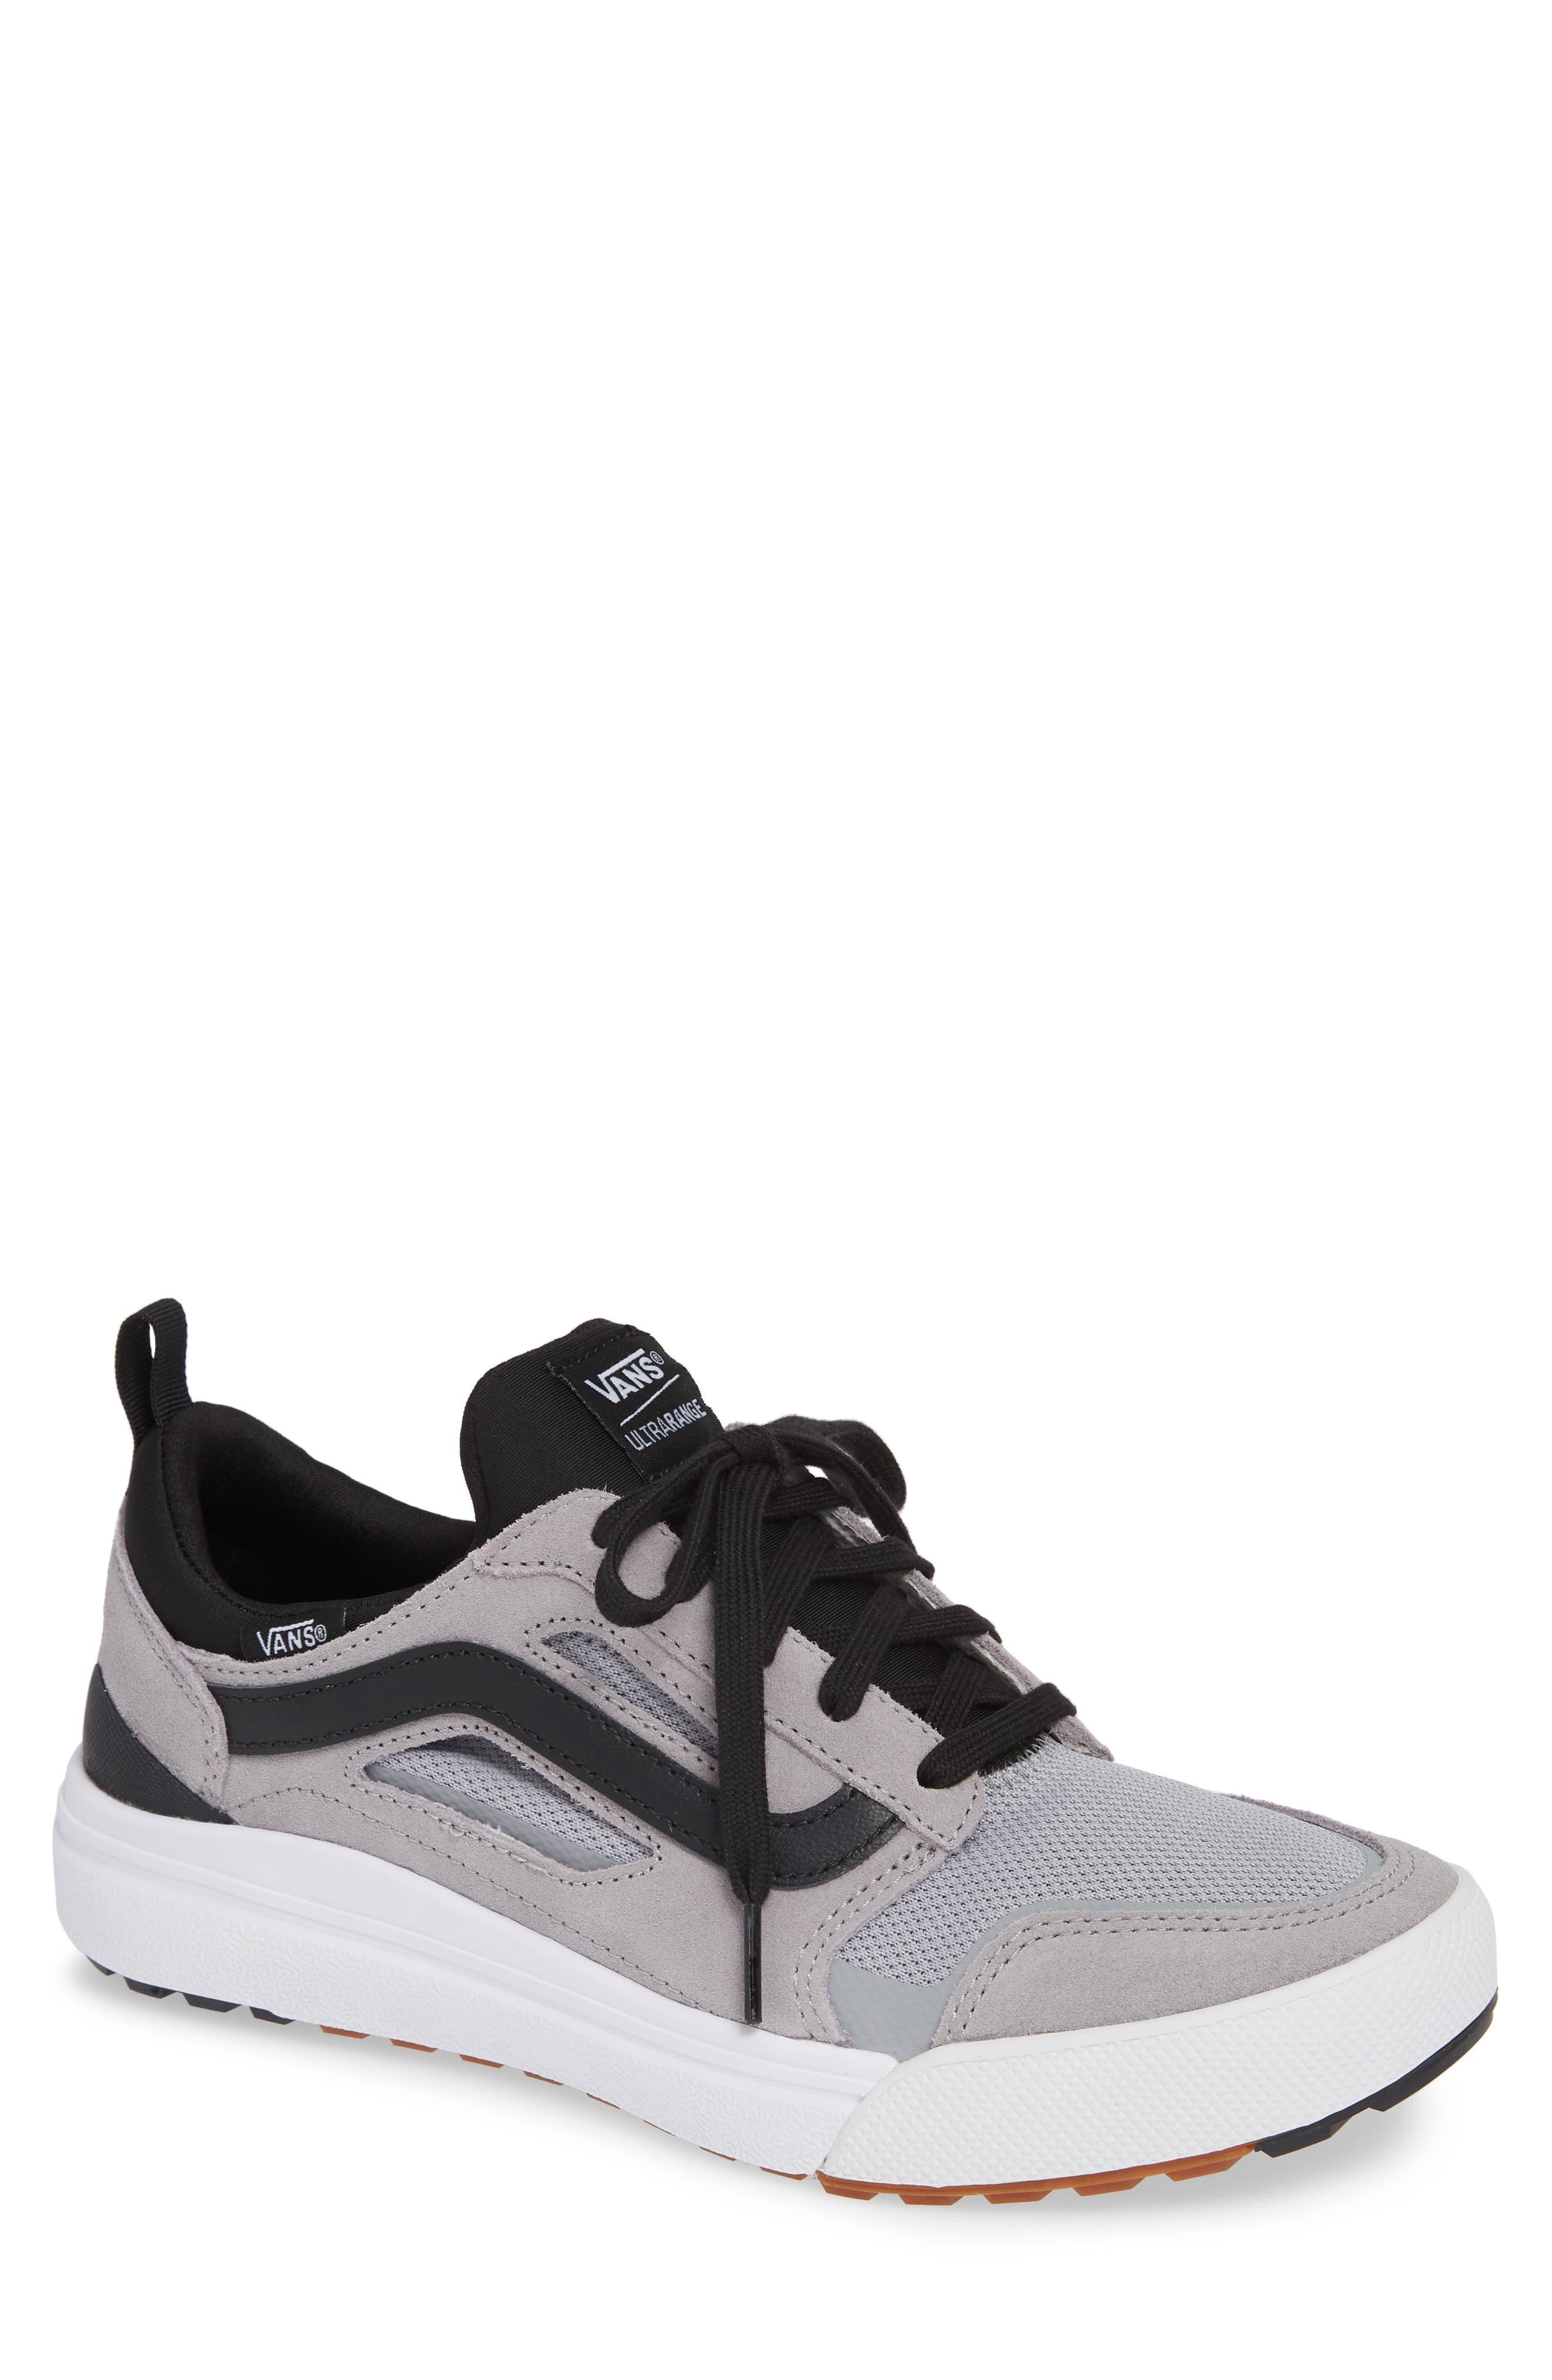 UltraRange 3D Sneaker,                             Main thumbnail 1, color,                             050